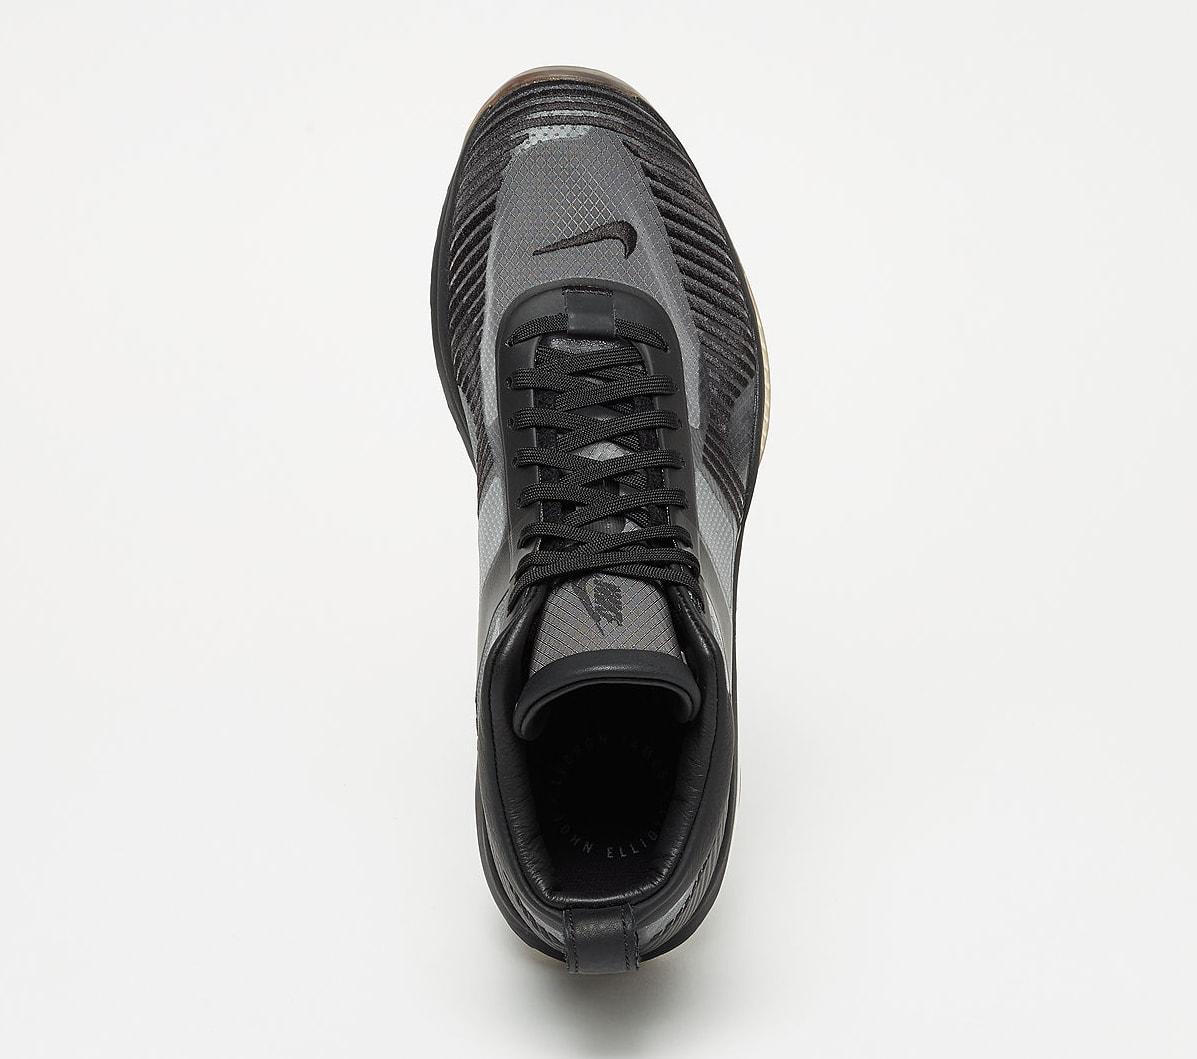 John Elliott x Nike LeBron Icon QS 'Black/Gum' AQ0114-001 (Top)